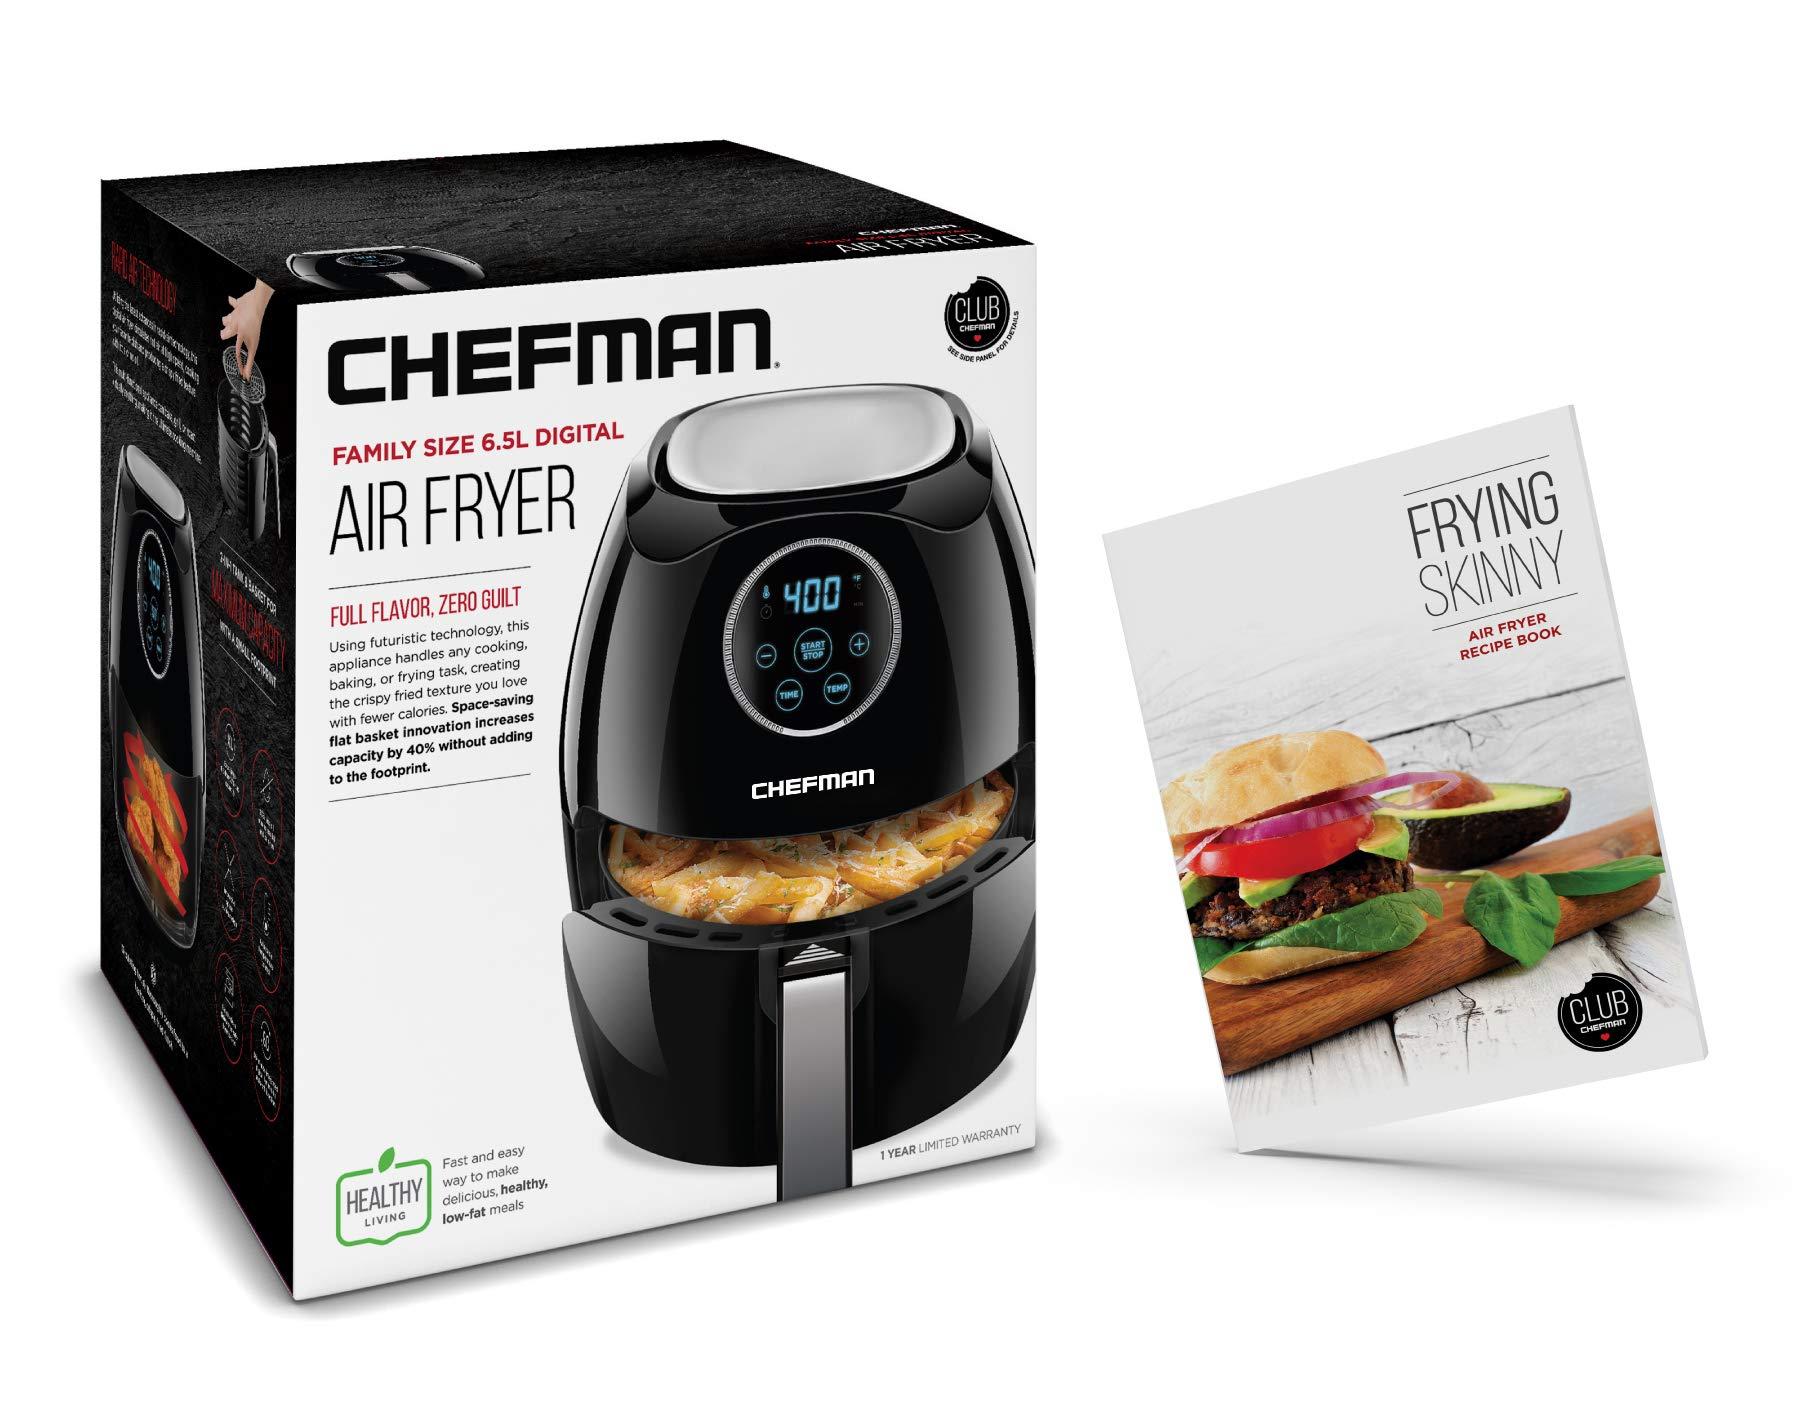 Chefman Digital 6.5 Liter/6.8 Quart Air Fryer Oven with Space Saving Flat Basket, Oil-Free Airfryer W/ 60 Min Timer & Auto Shut Off, Dishwasher Safe Parts, BPA Free, Family Size, X-Large, Black by Chefman (Image #7)